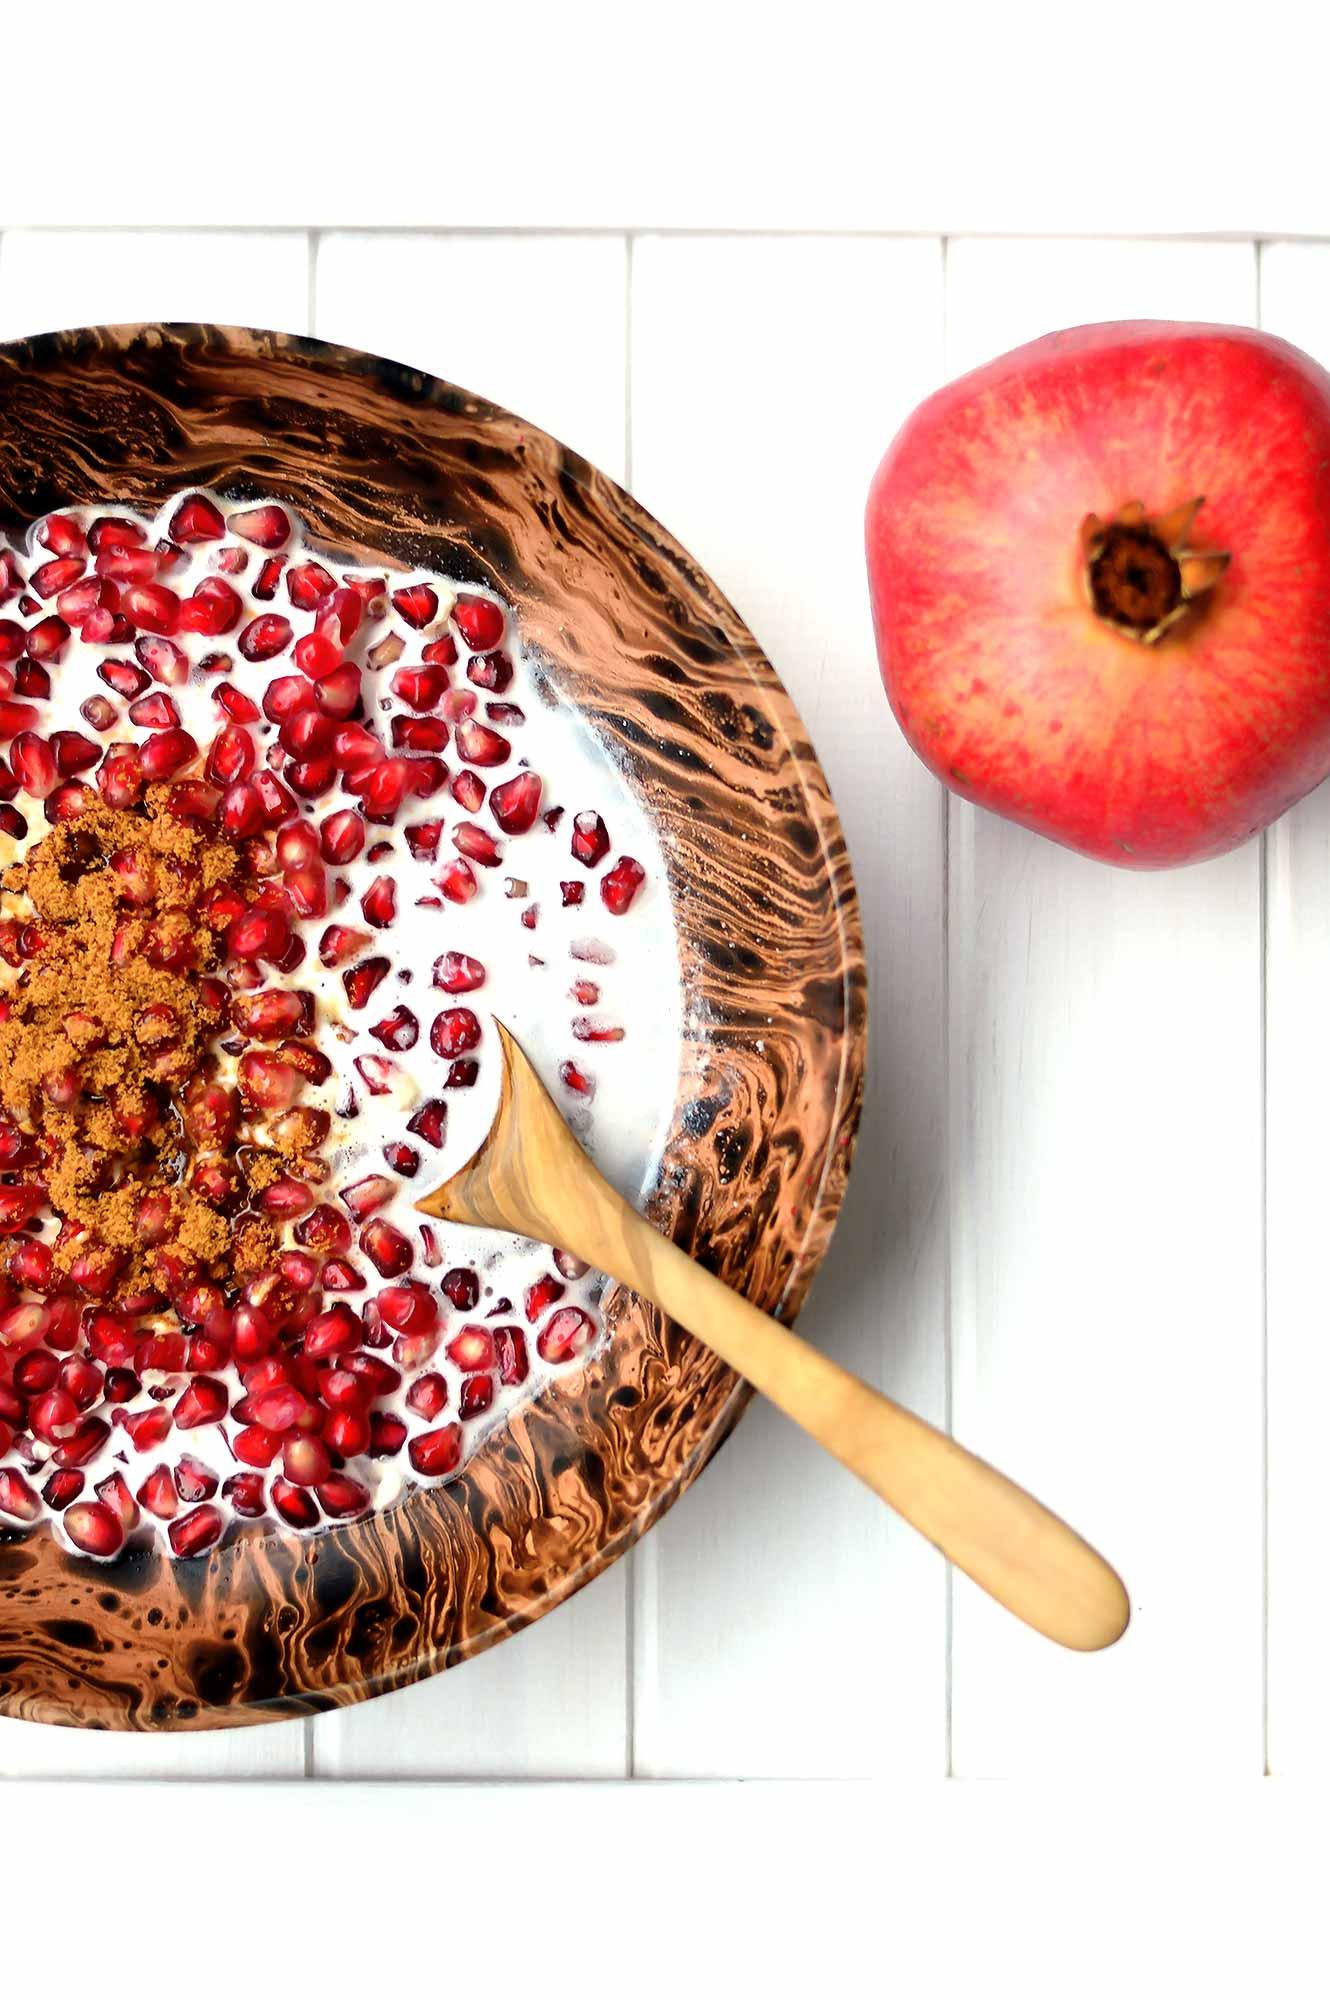 Pomegranate Breakfast Bowl - sweet and refreshing|www.thebrightbird.com